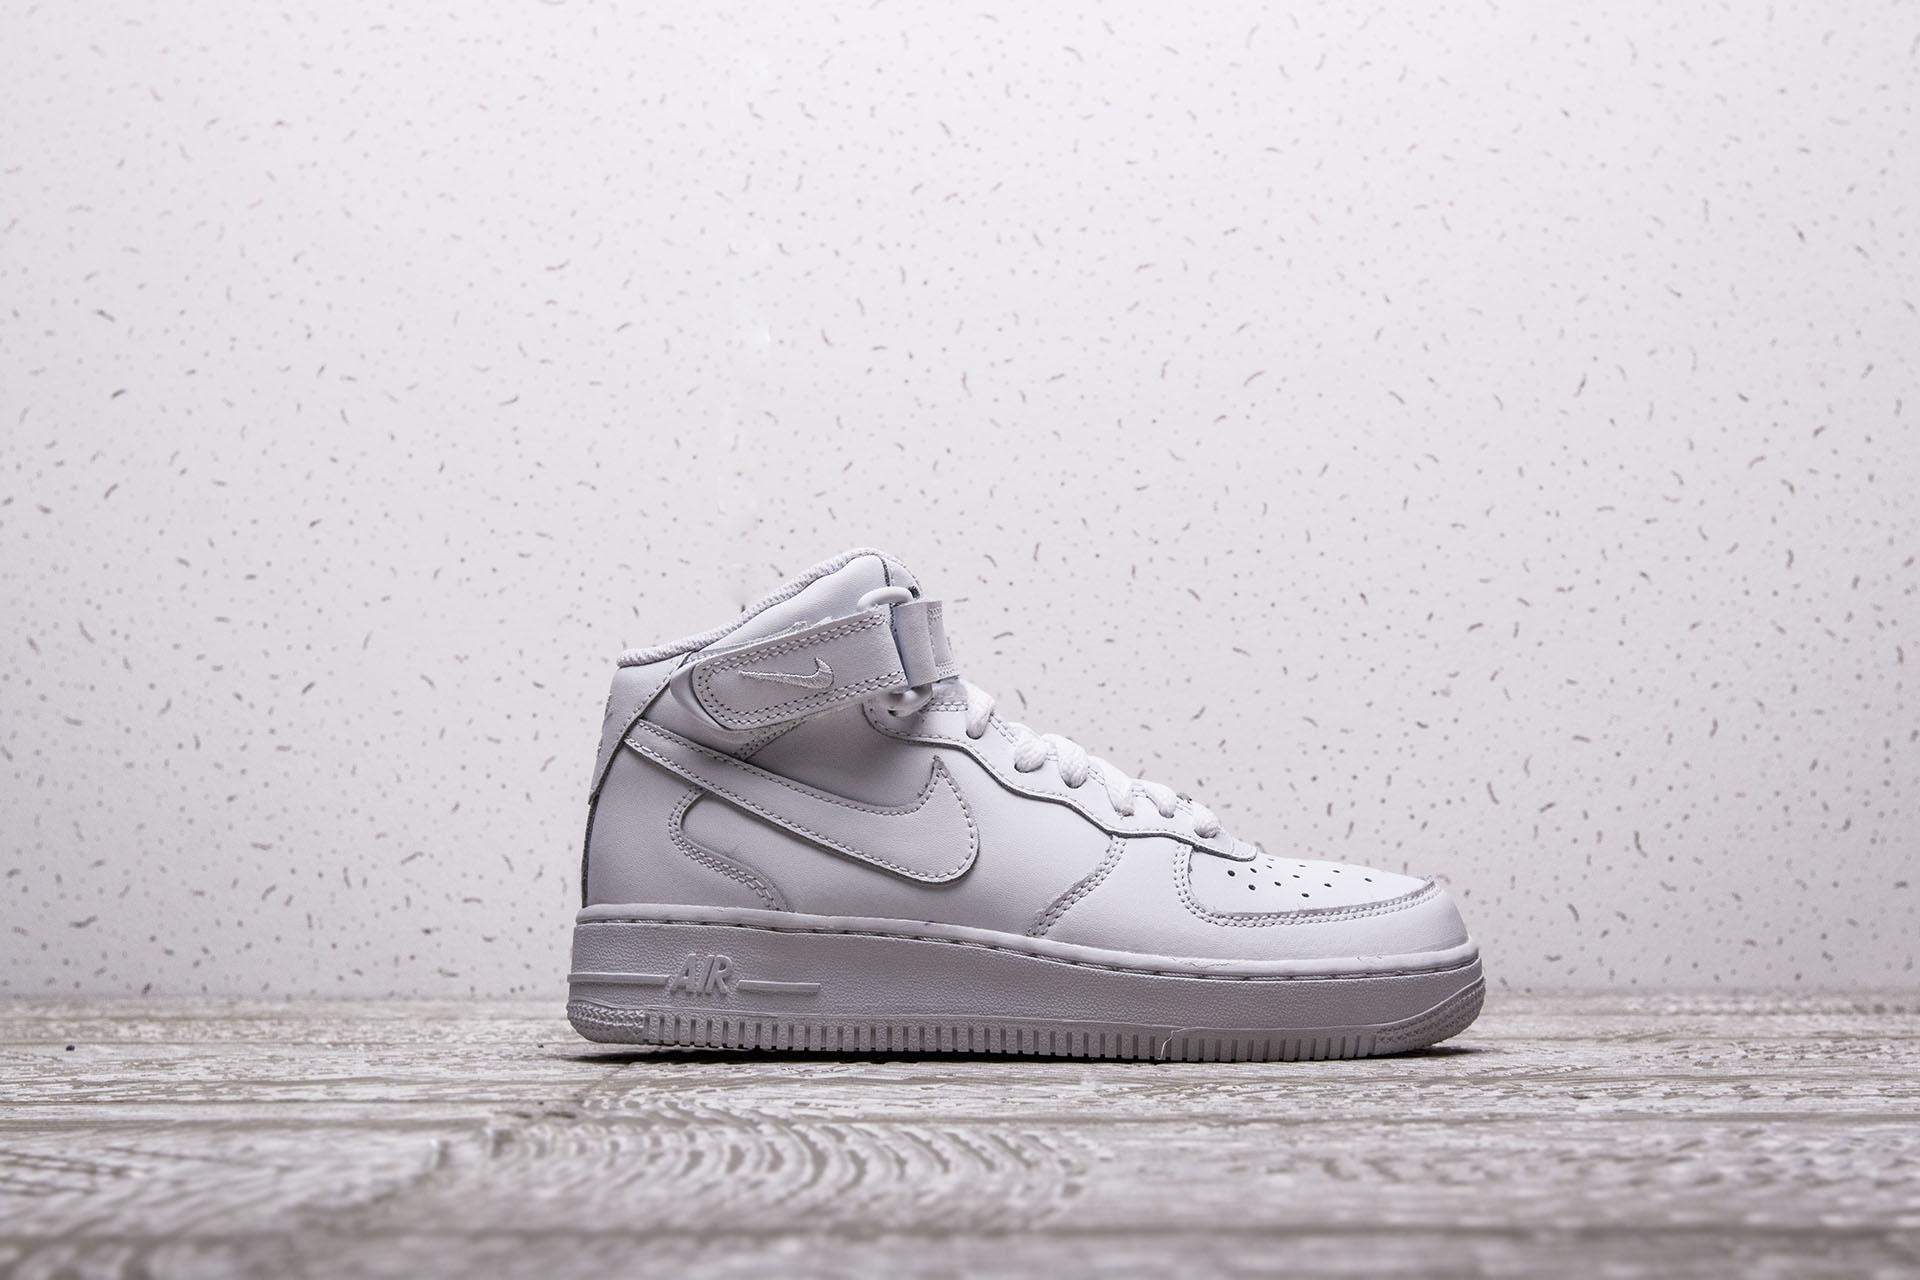 eb8eafb0 Купить белые детские кроссовки Air Force 1 Mid GS от Nike (314195 ...